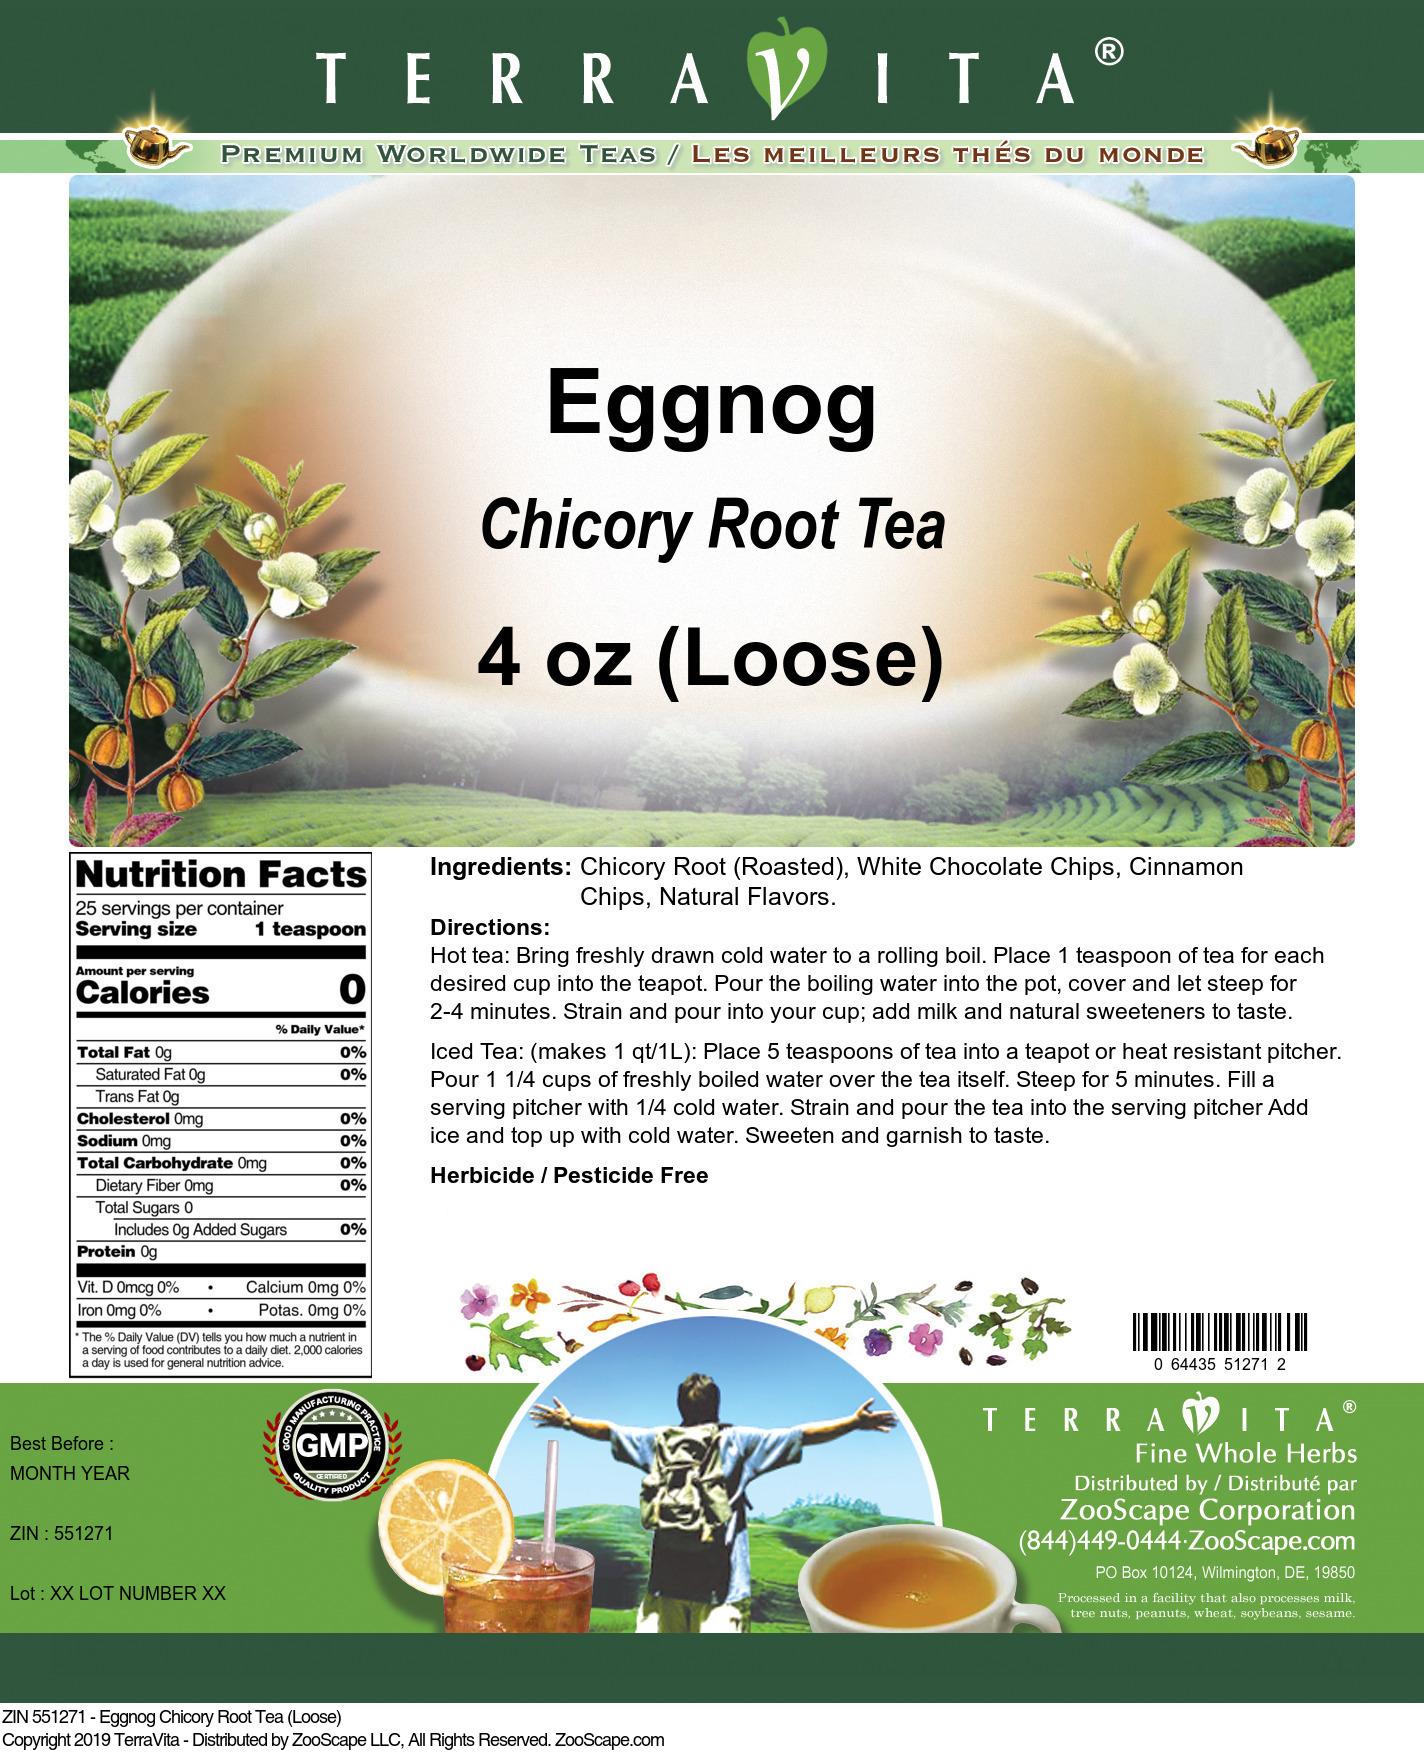 Eggnog Chicory Root